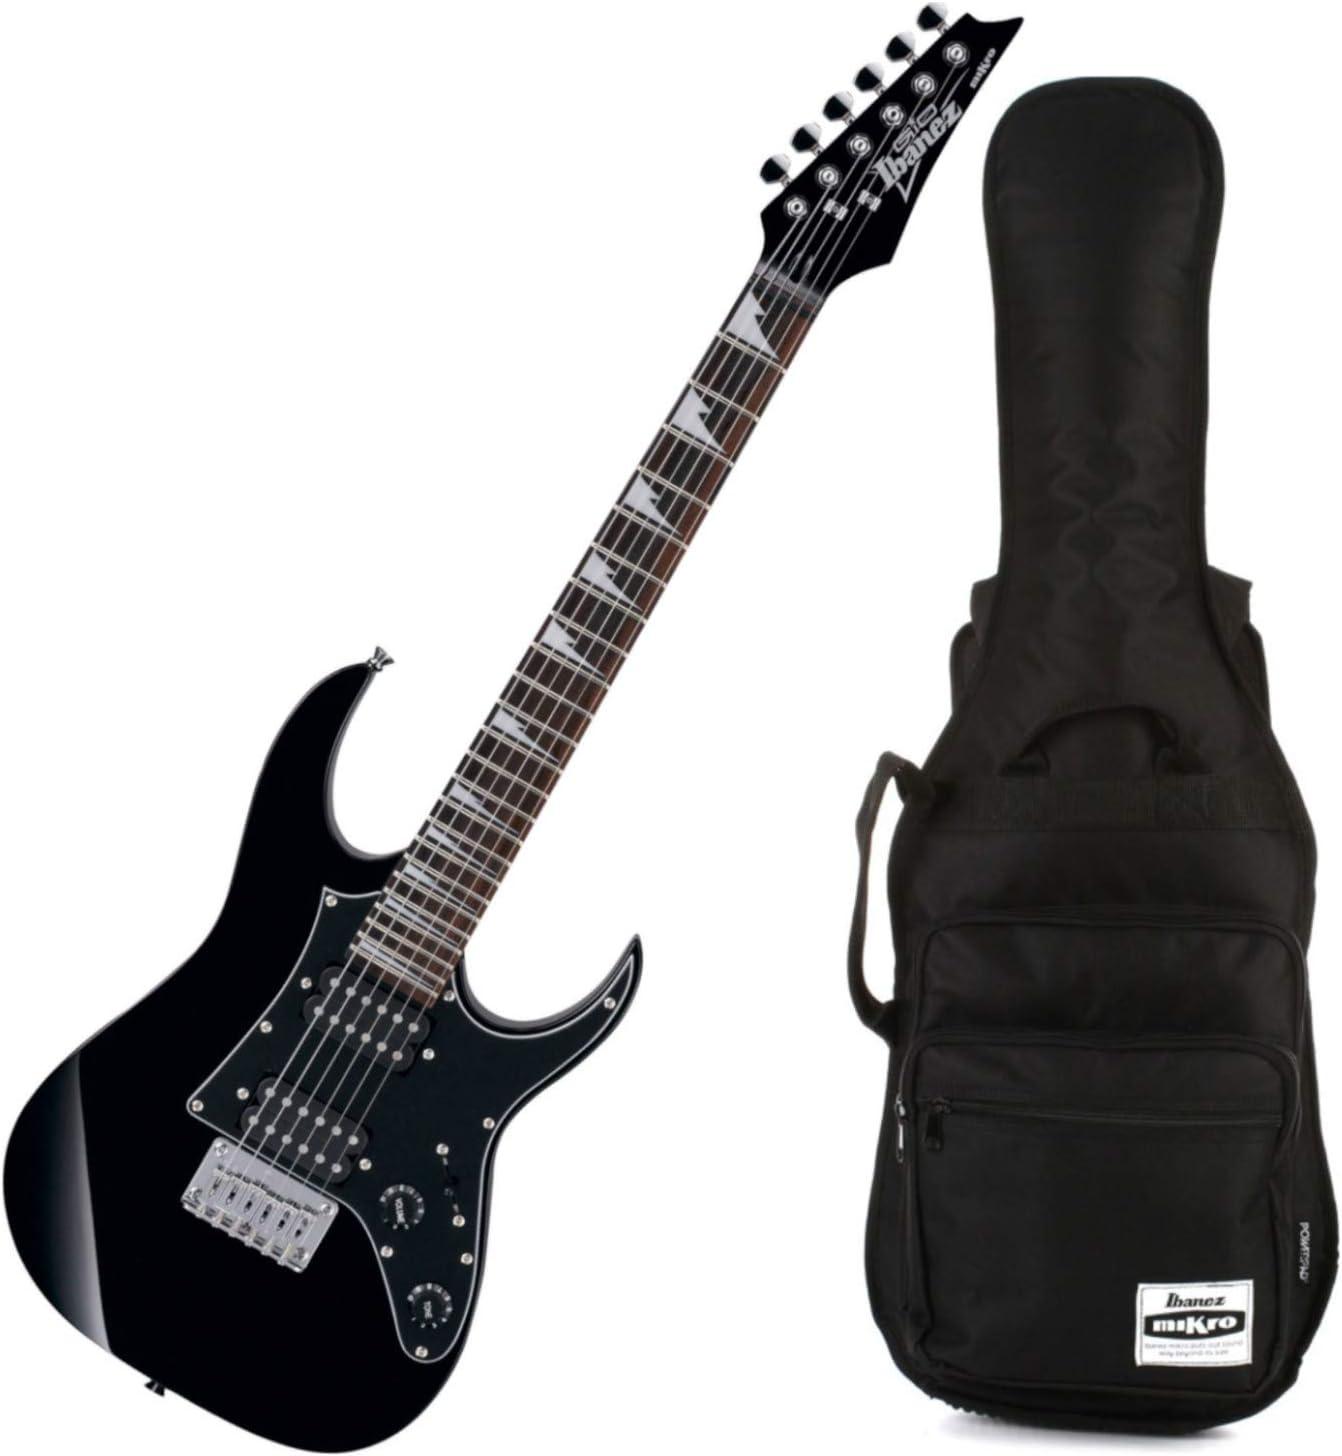 Ibanez GRGM21 GRG Mikro Electric Guitar Junior Mini Black Night w//Ibanez Bag